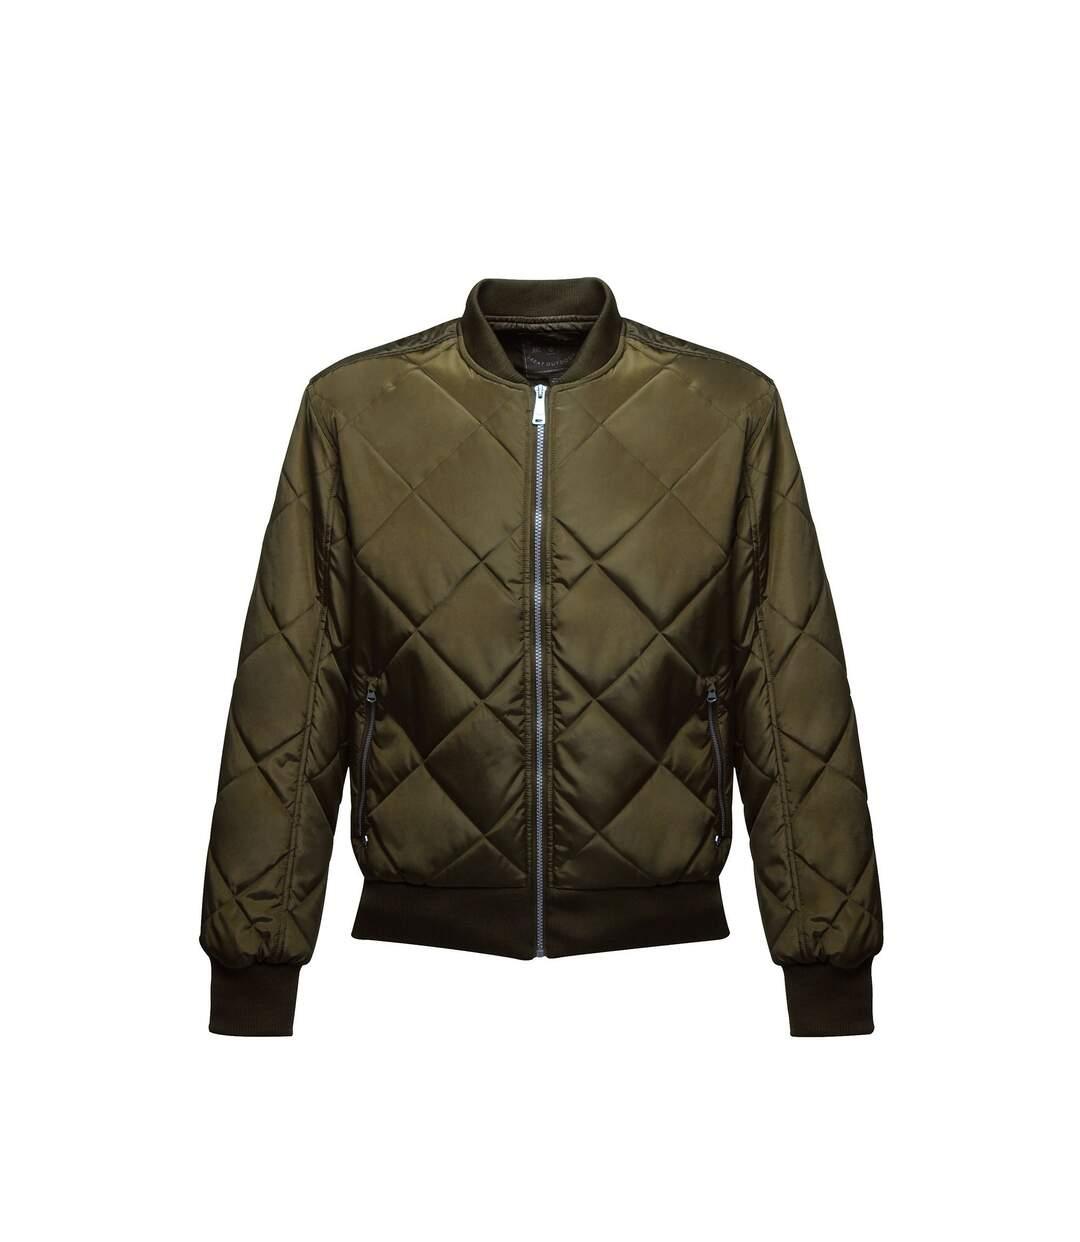 Regatta Mens Originals Fallowfield Bomber Jacket (Dark Khaki) - UTRG2942